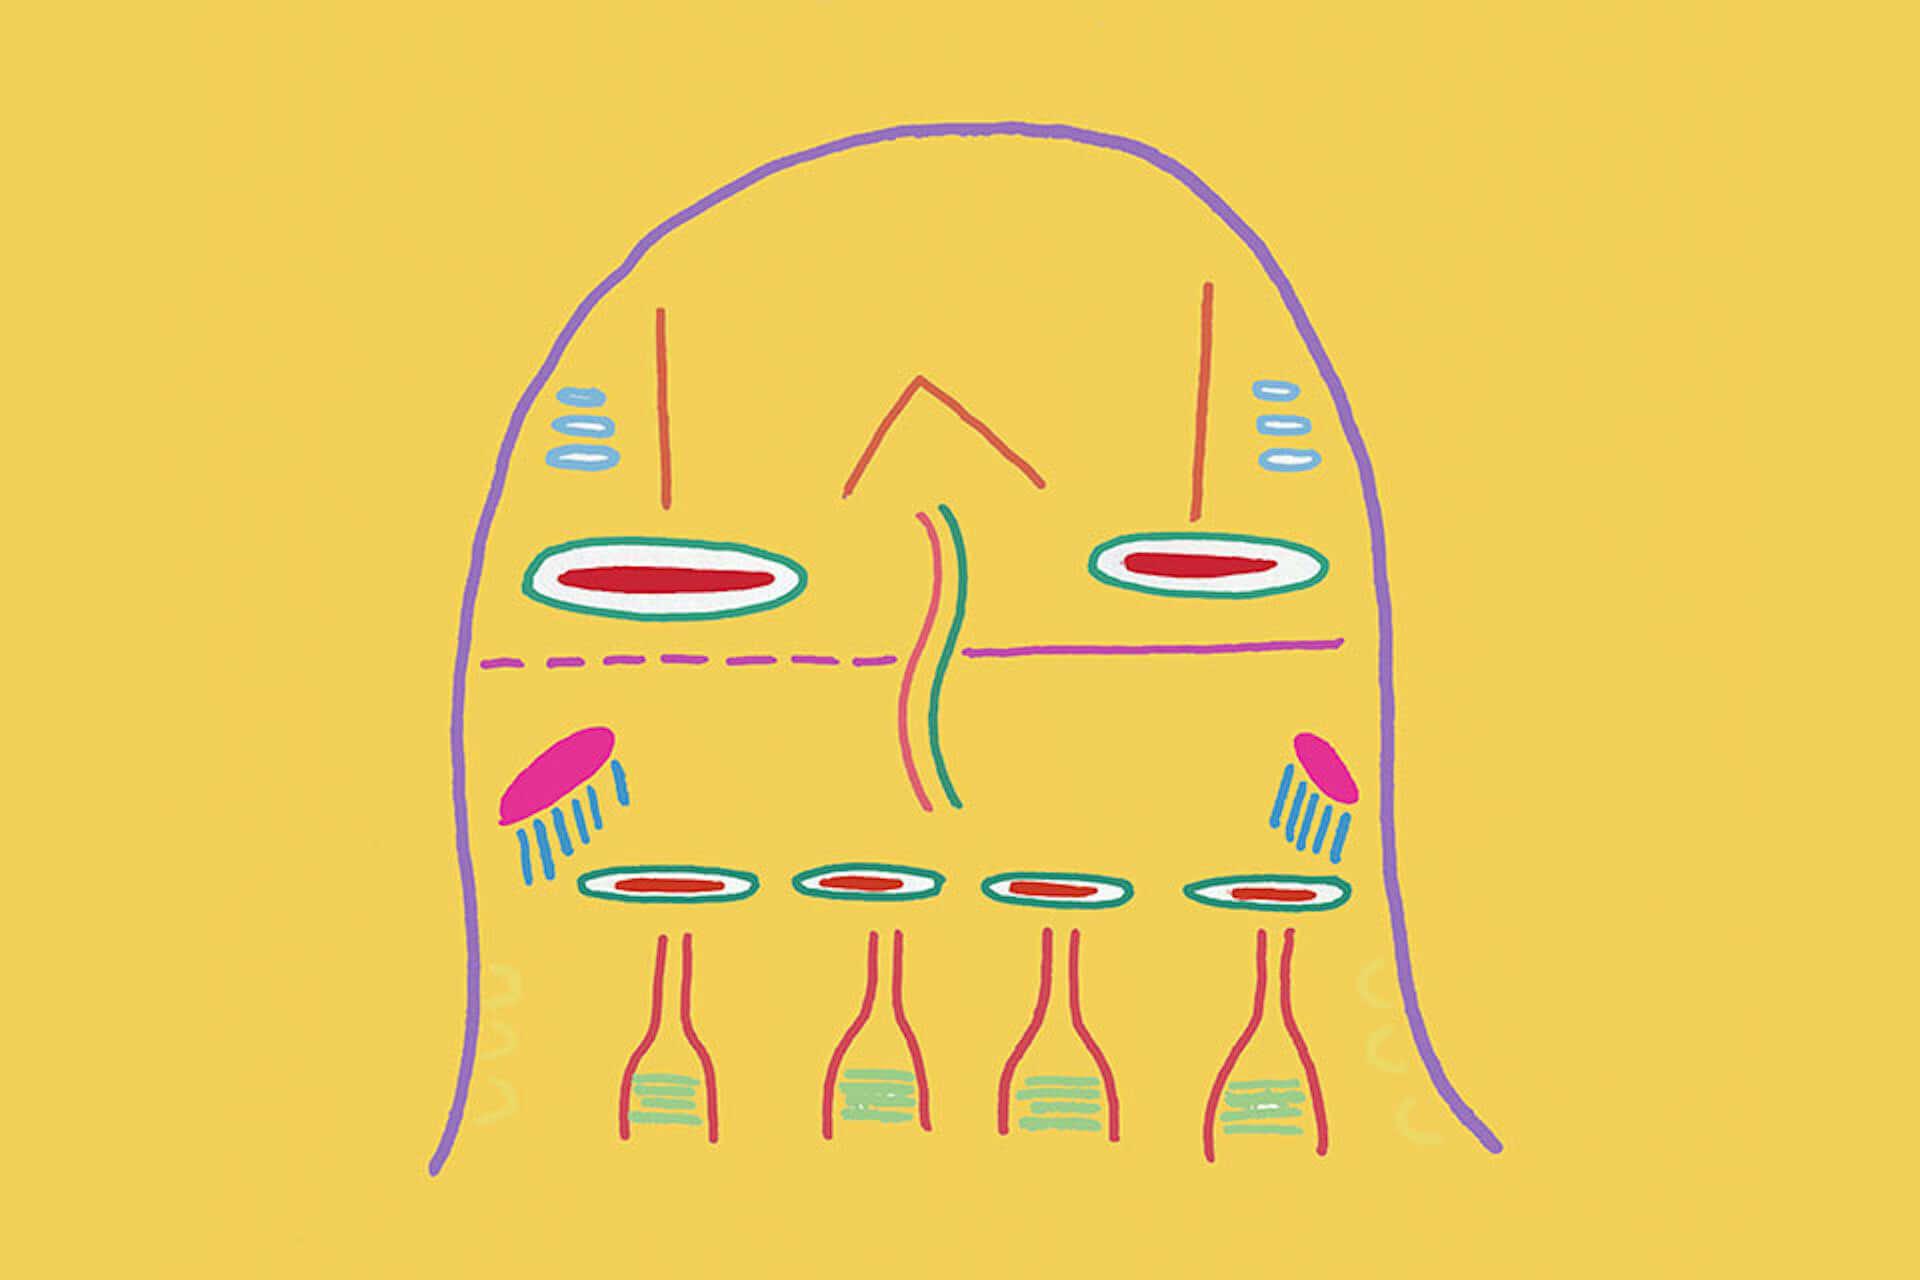 Mogwai、Airhead、食品まつりがリミックスしたD.A.N.の楽曲が3週連続でリリース決定|第1弾は今夜プレミア公開 music200522_dan_remix_6-1920x1280